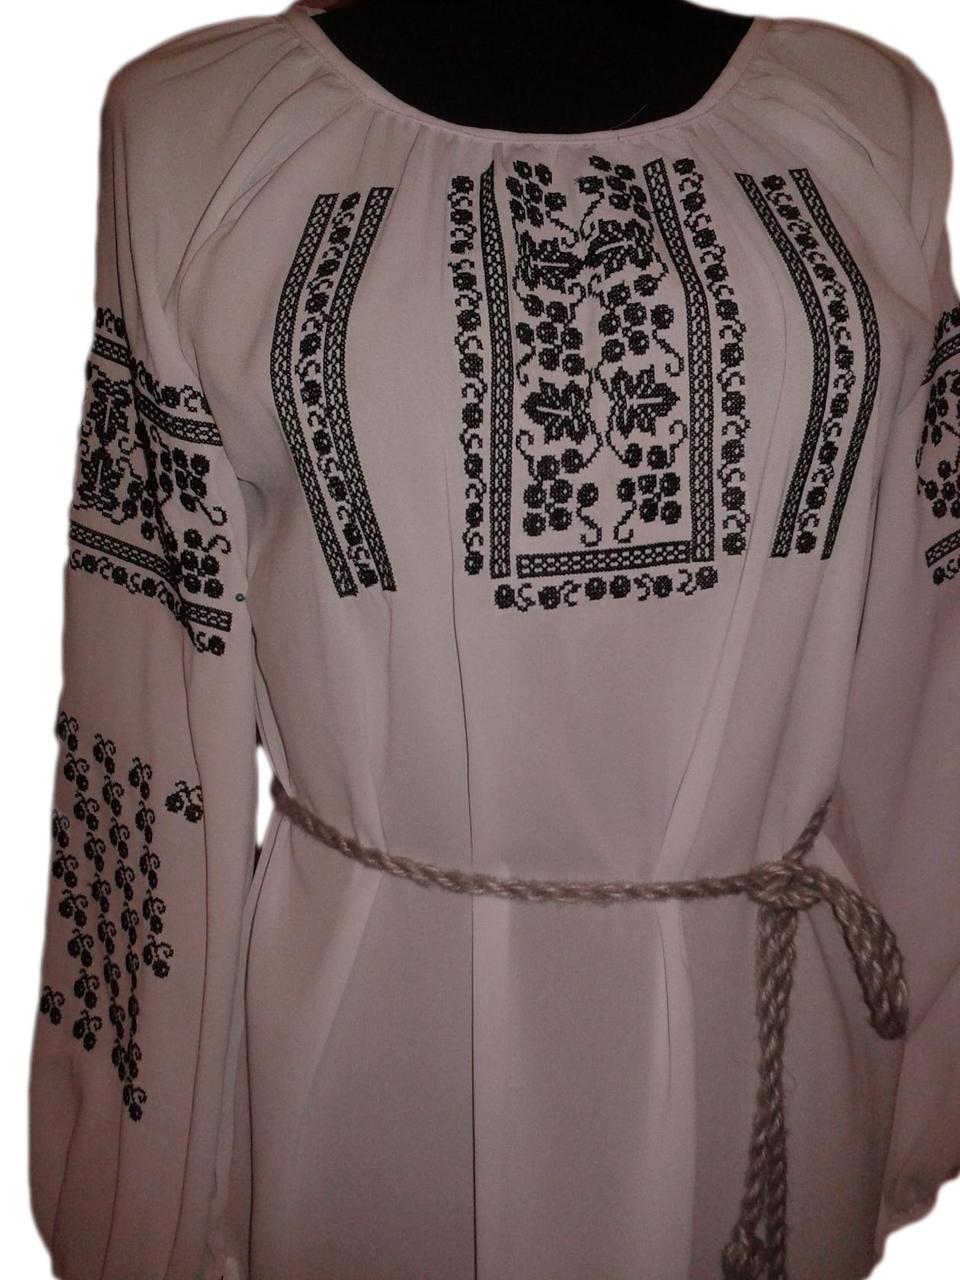 fdfb4865bfa58e Жіноча вишита блузка